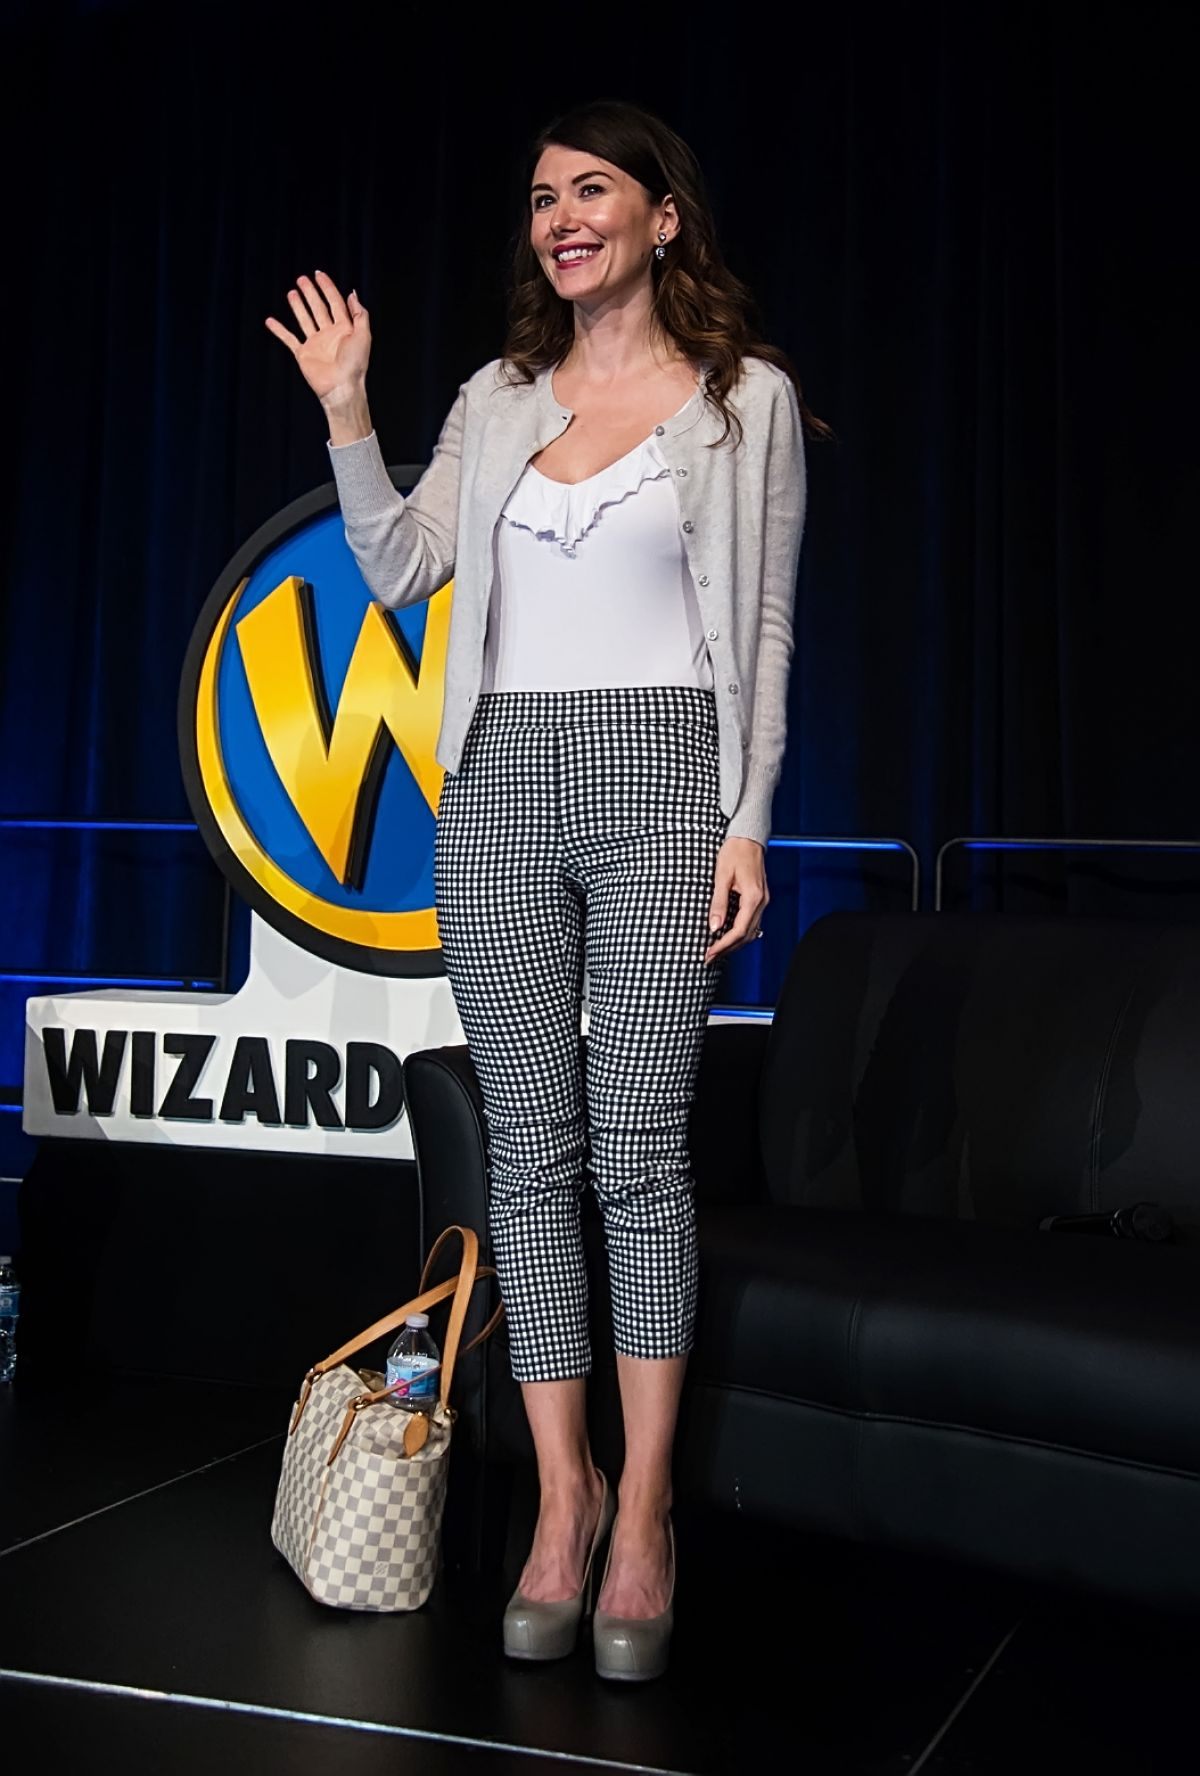 Jewel Staite Ar Wizard World Philadelphia Comic Pennsylvania Convention Center 12 Demi Lovato Email